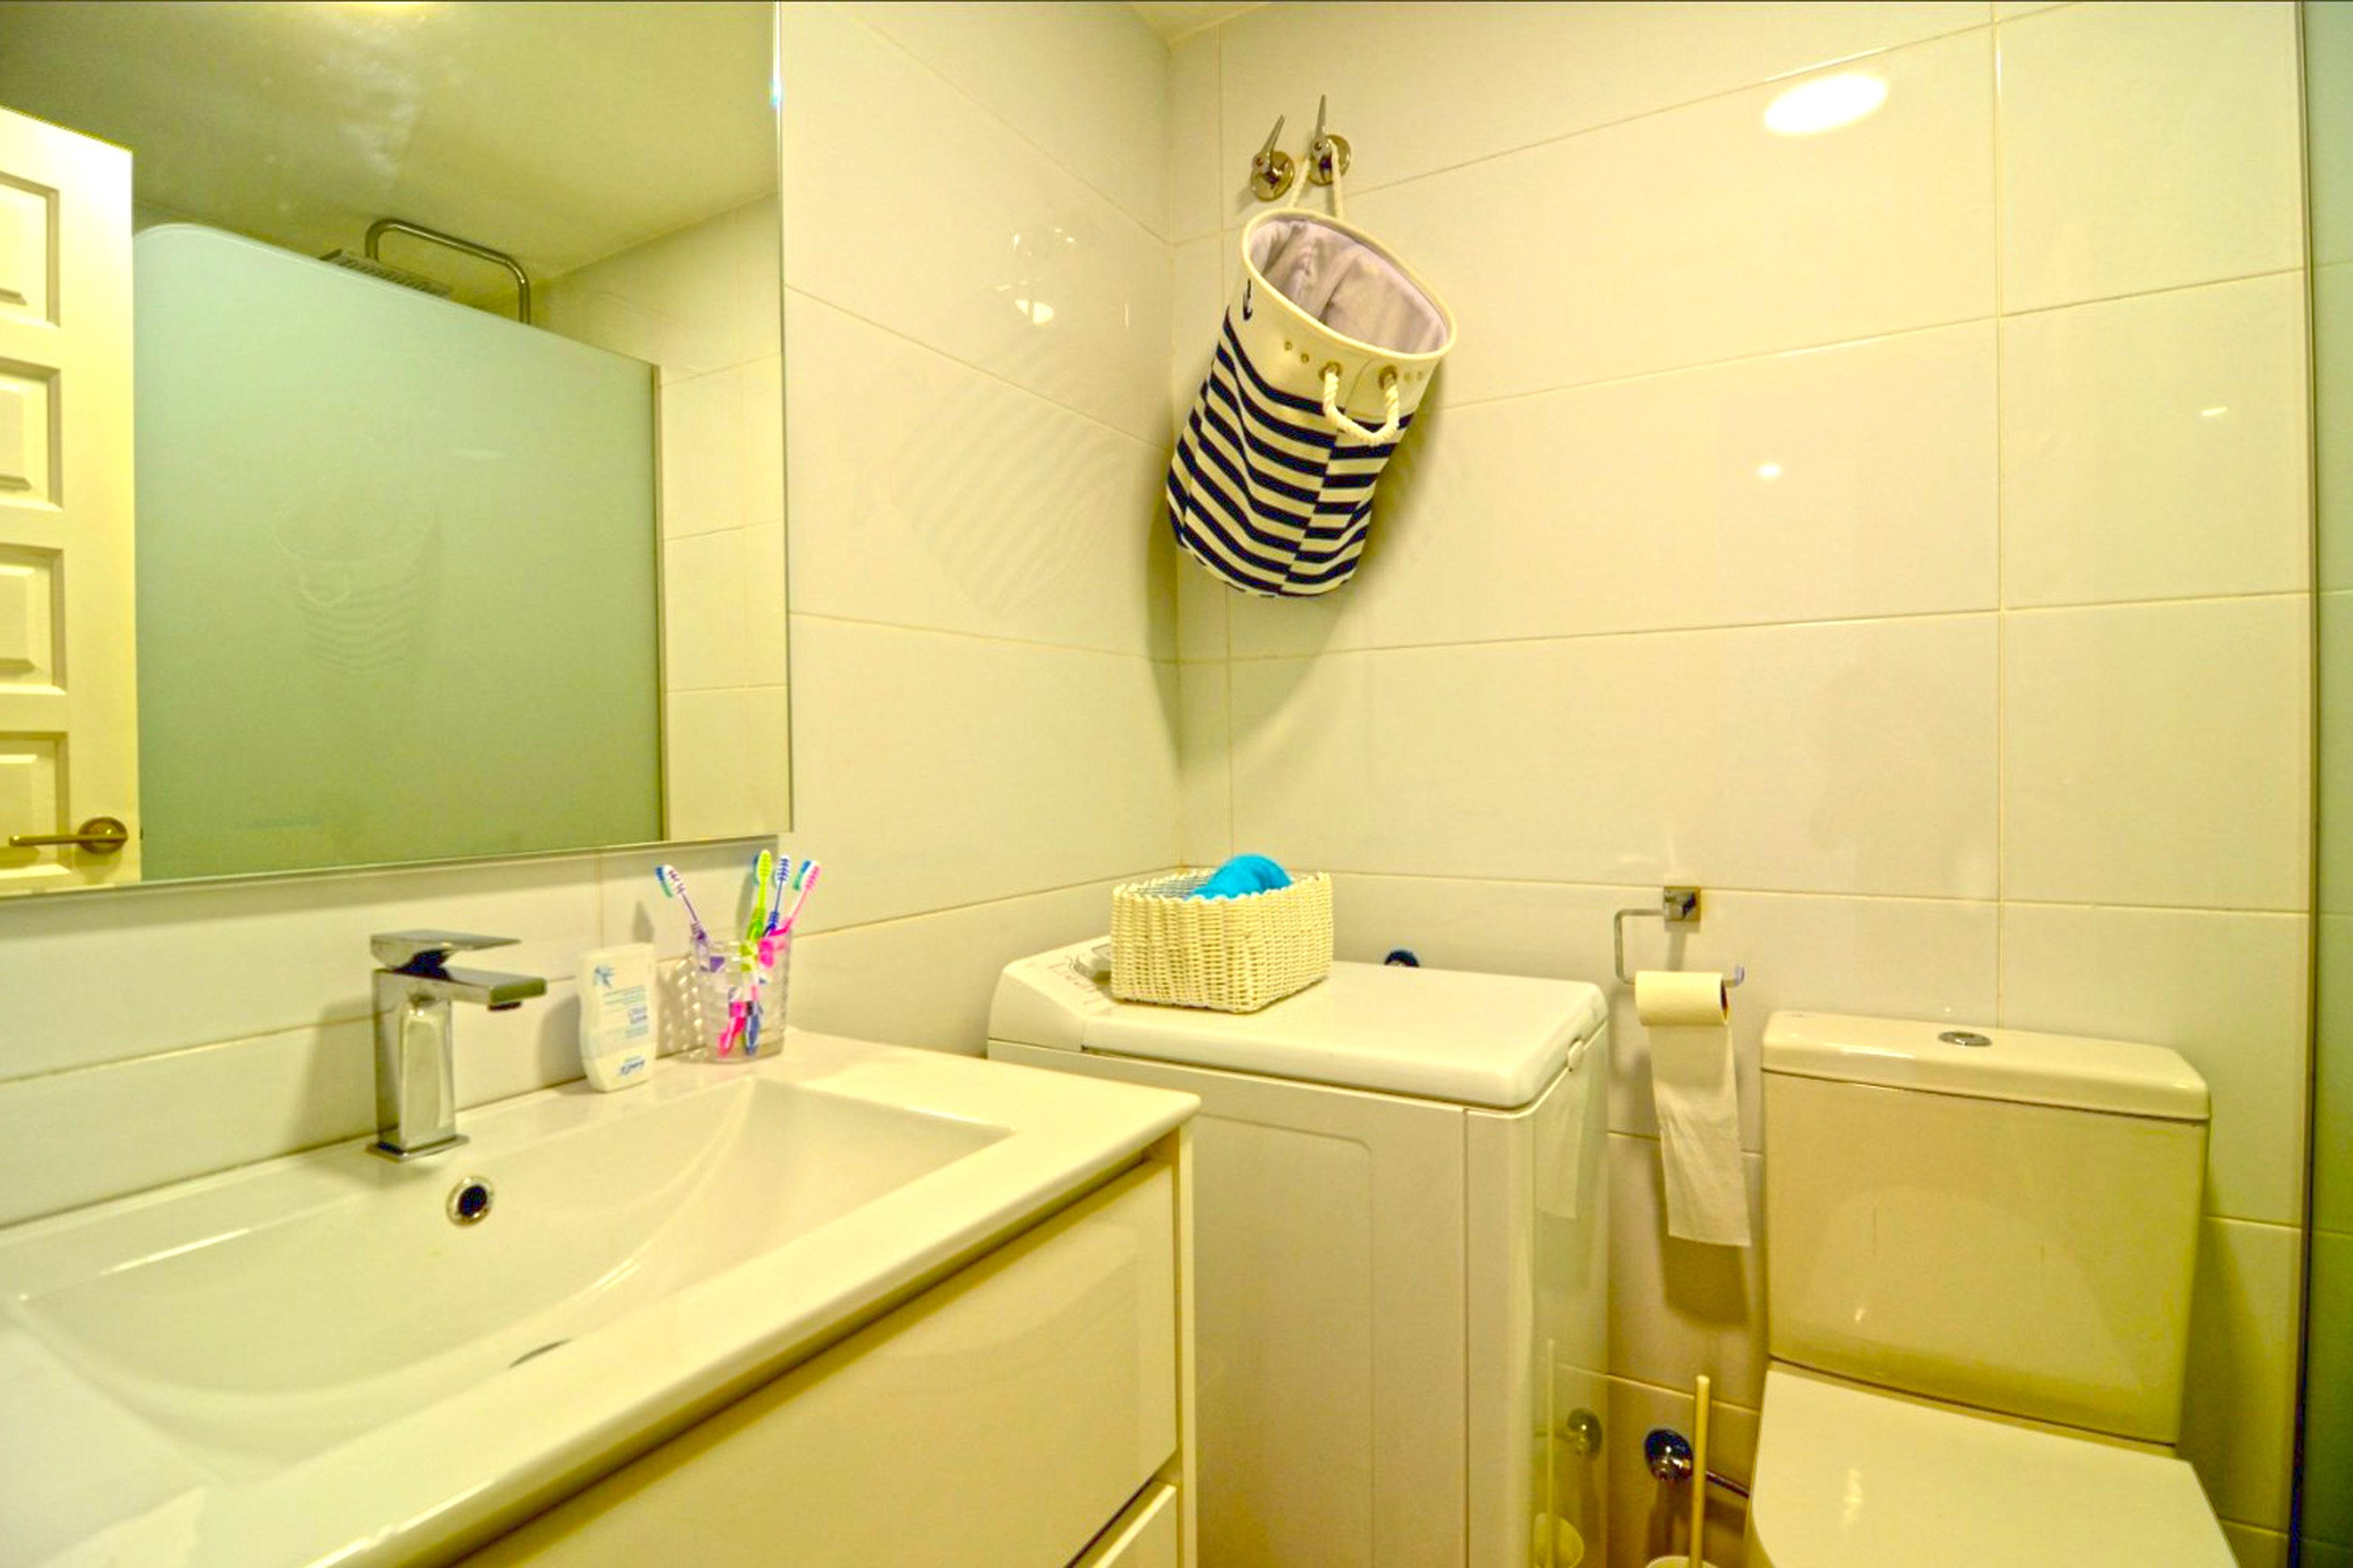 Appartement Vistamar l'Escala met de douche, wc en wasmachine